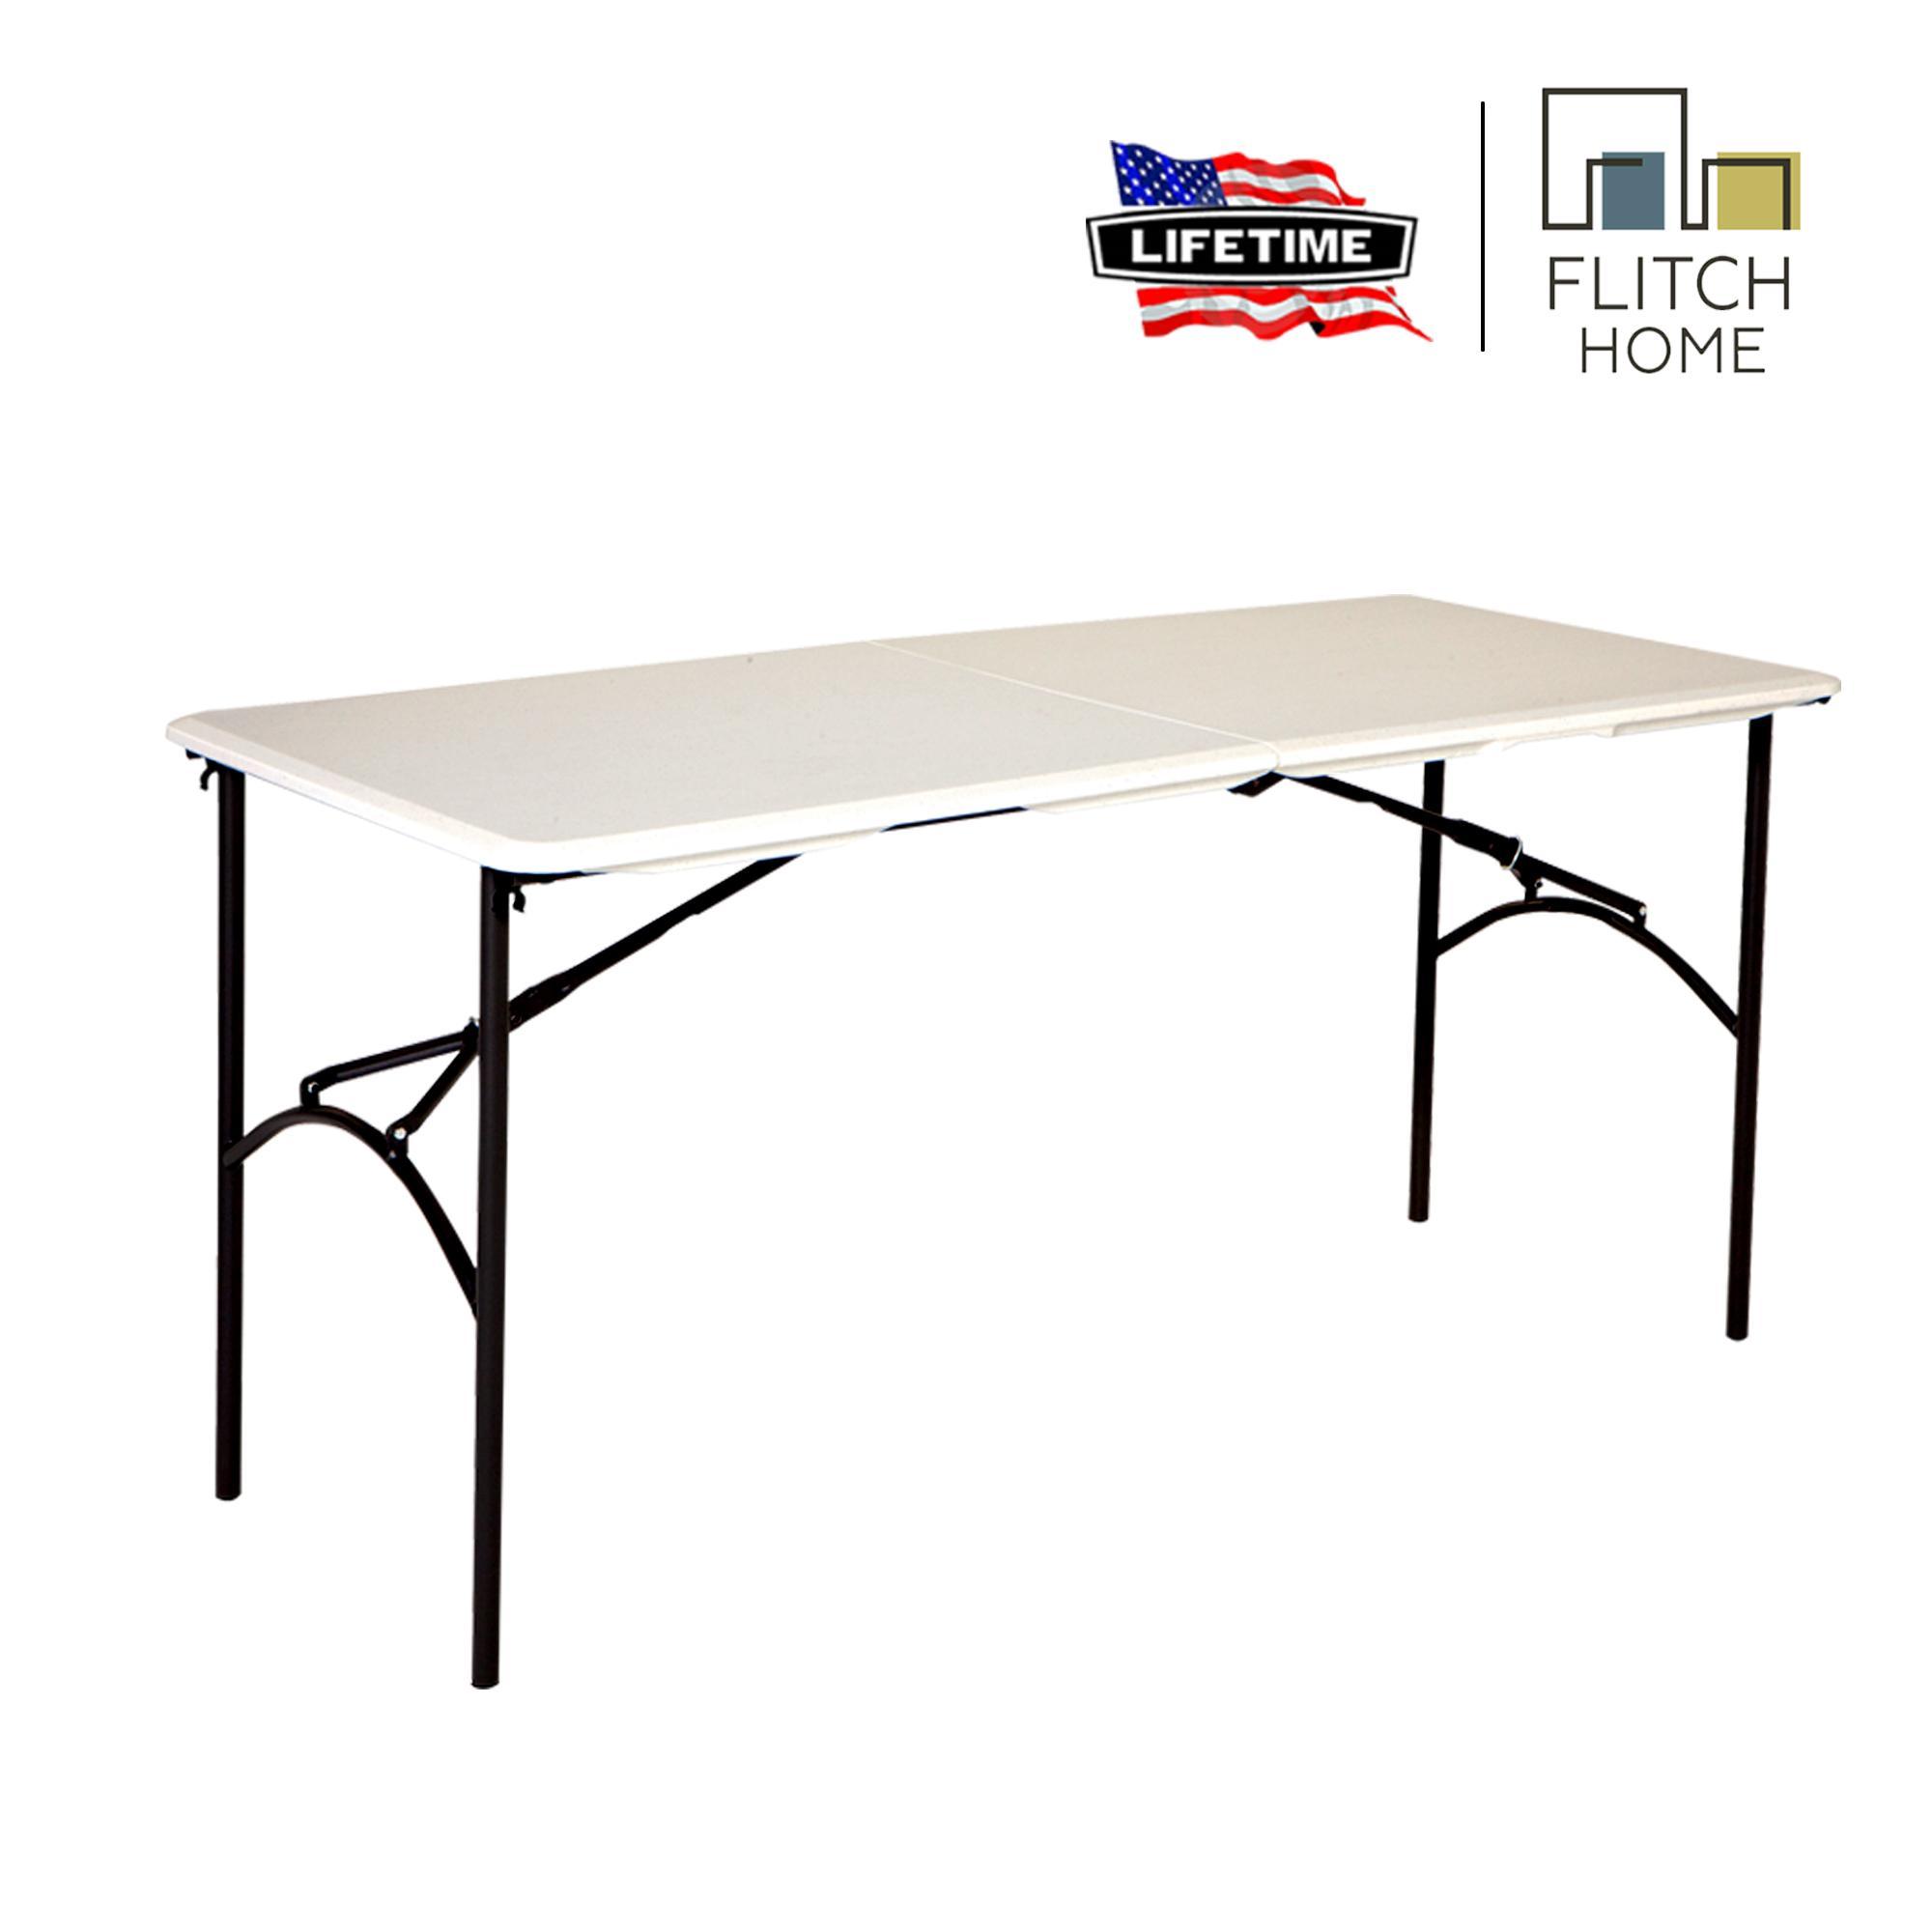 Tremendous Lifetime 5 Ft Fold In Half Table White Download Free Architecture Designs Rallybritishbridgeorg